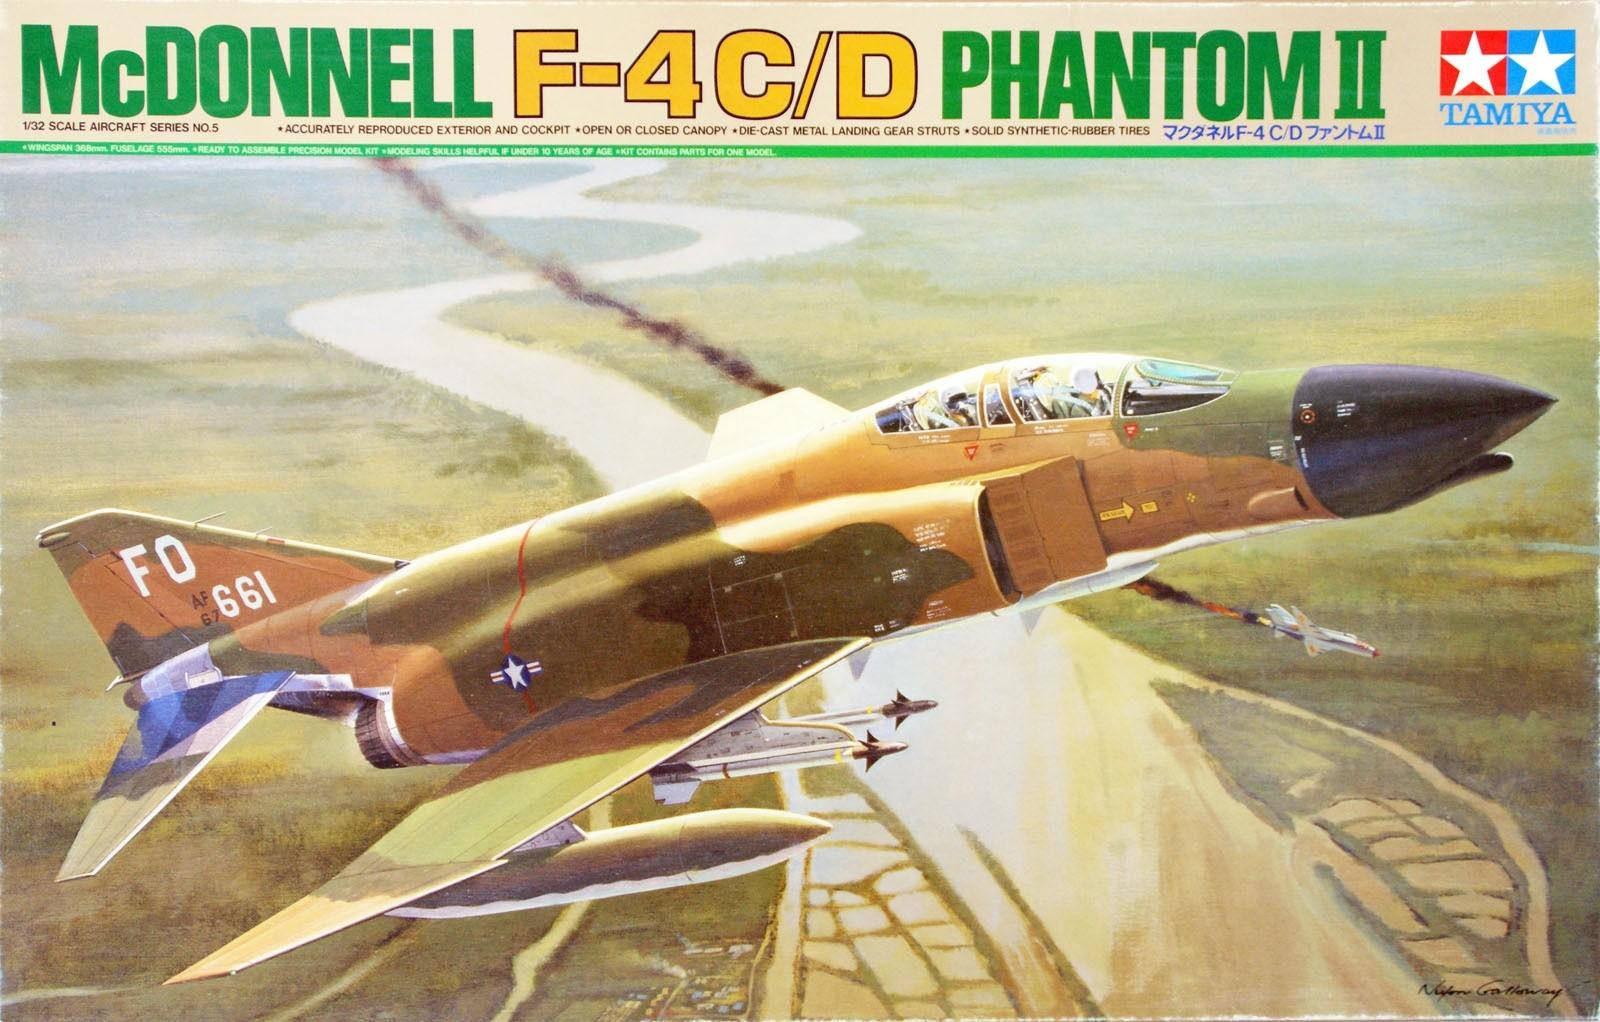 Tamiya 1/32 McDonnell F-4 C/D Phantom Model Kit